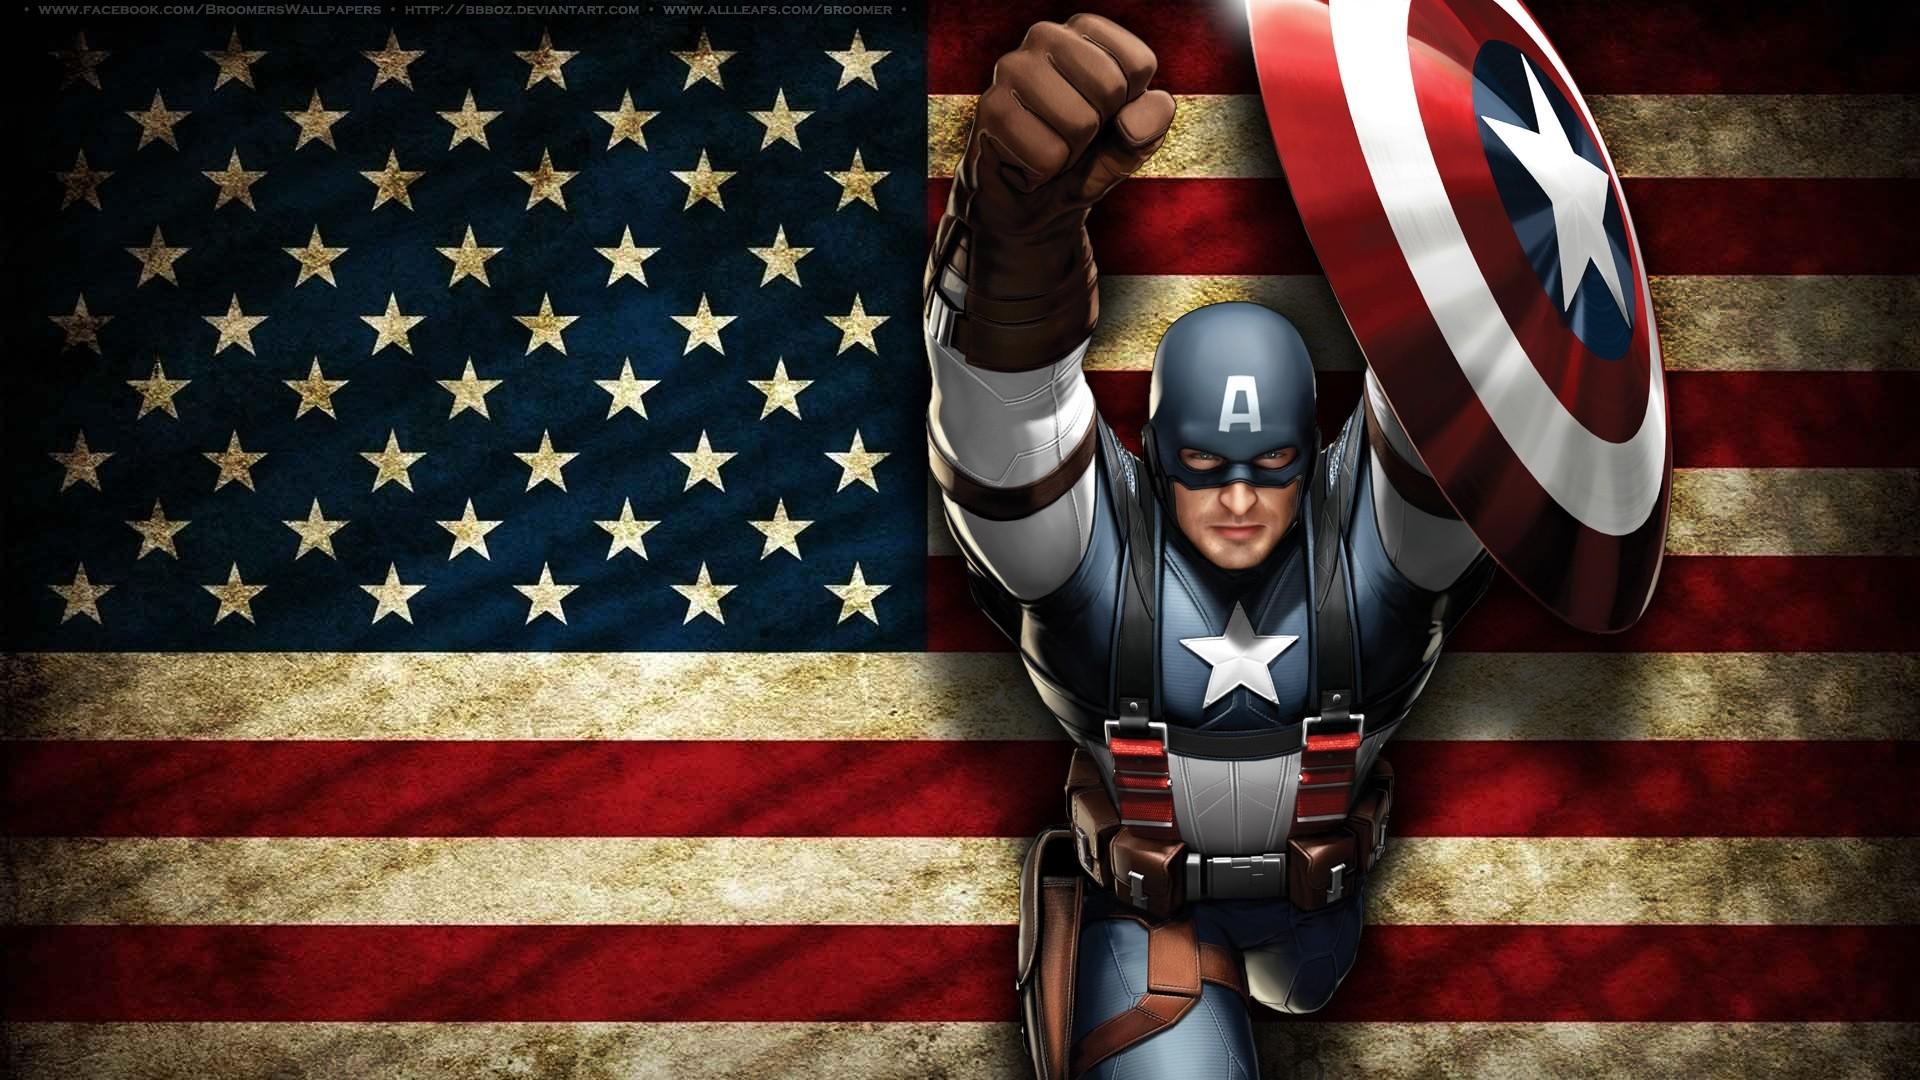 Captain America screen wallpaper